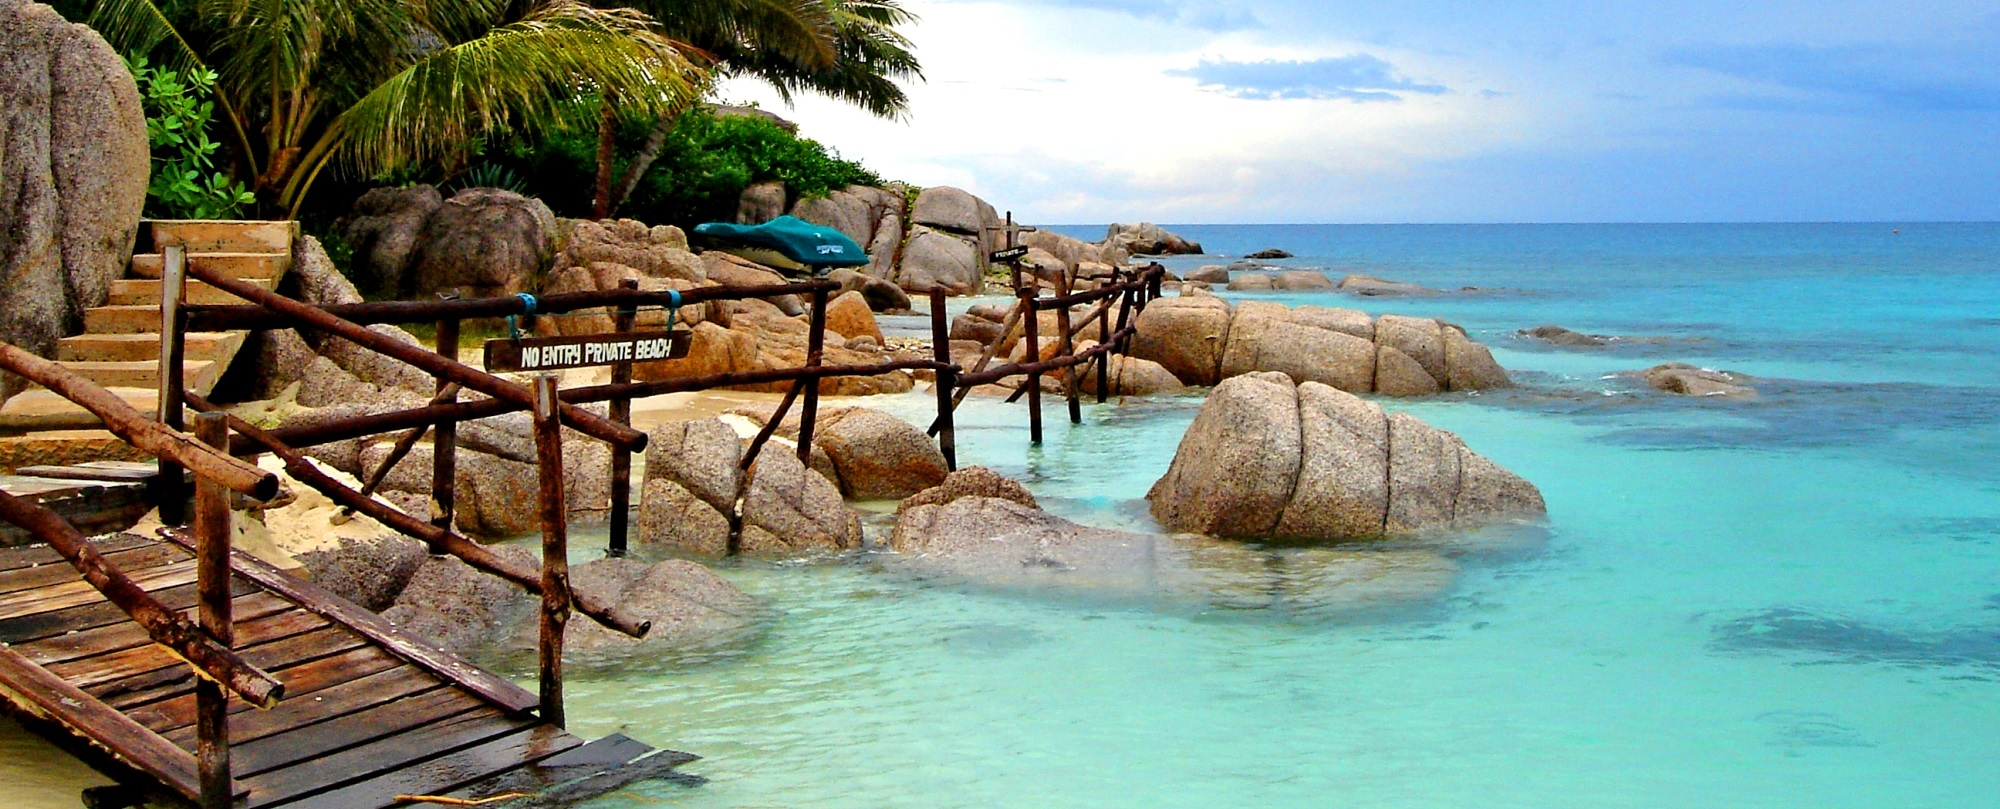 Морское сафари вокруг острова Панган